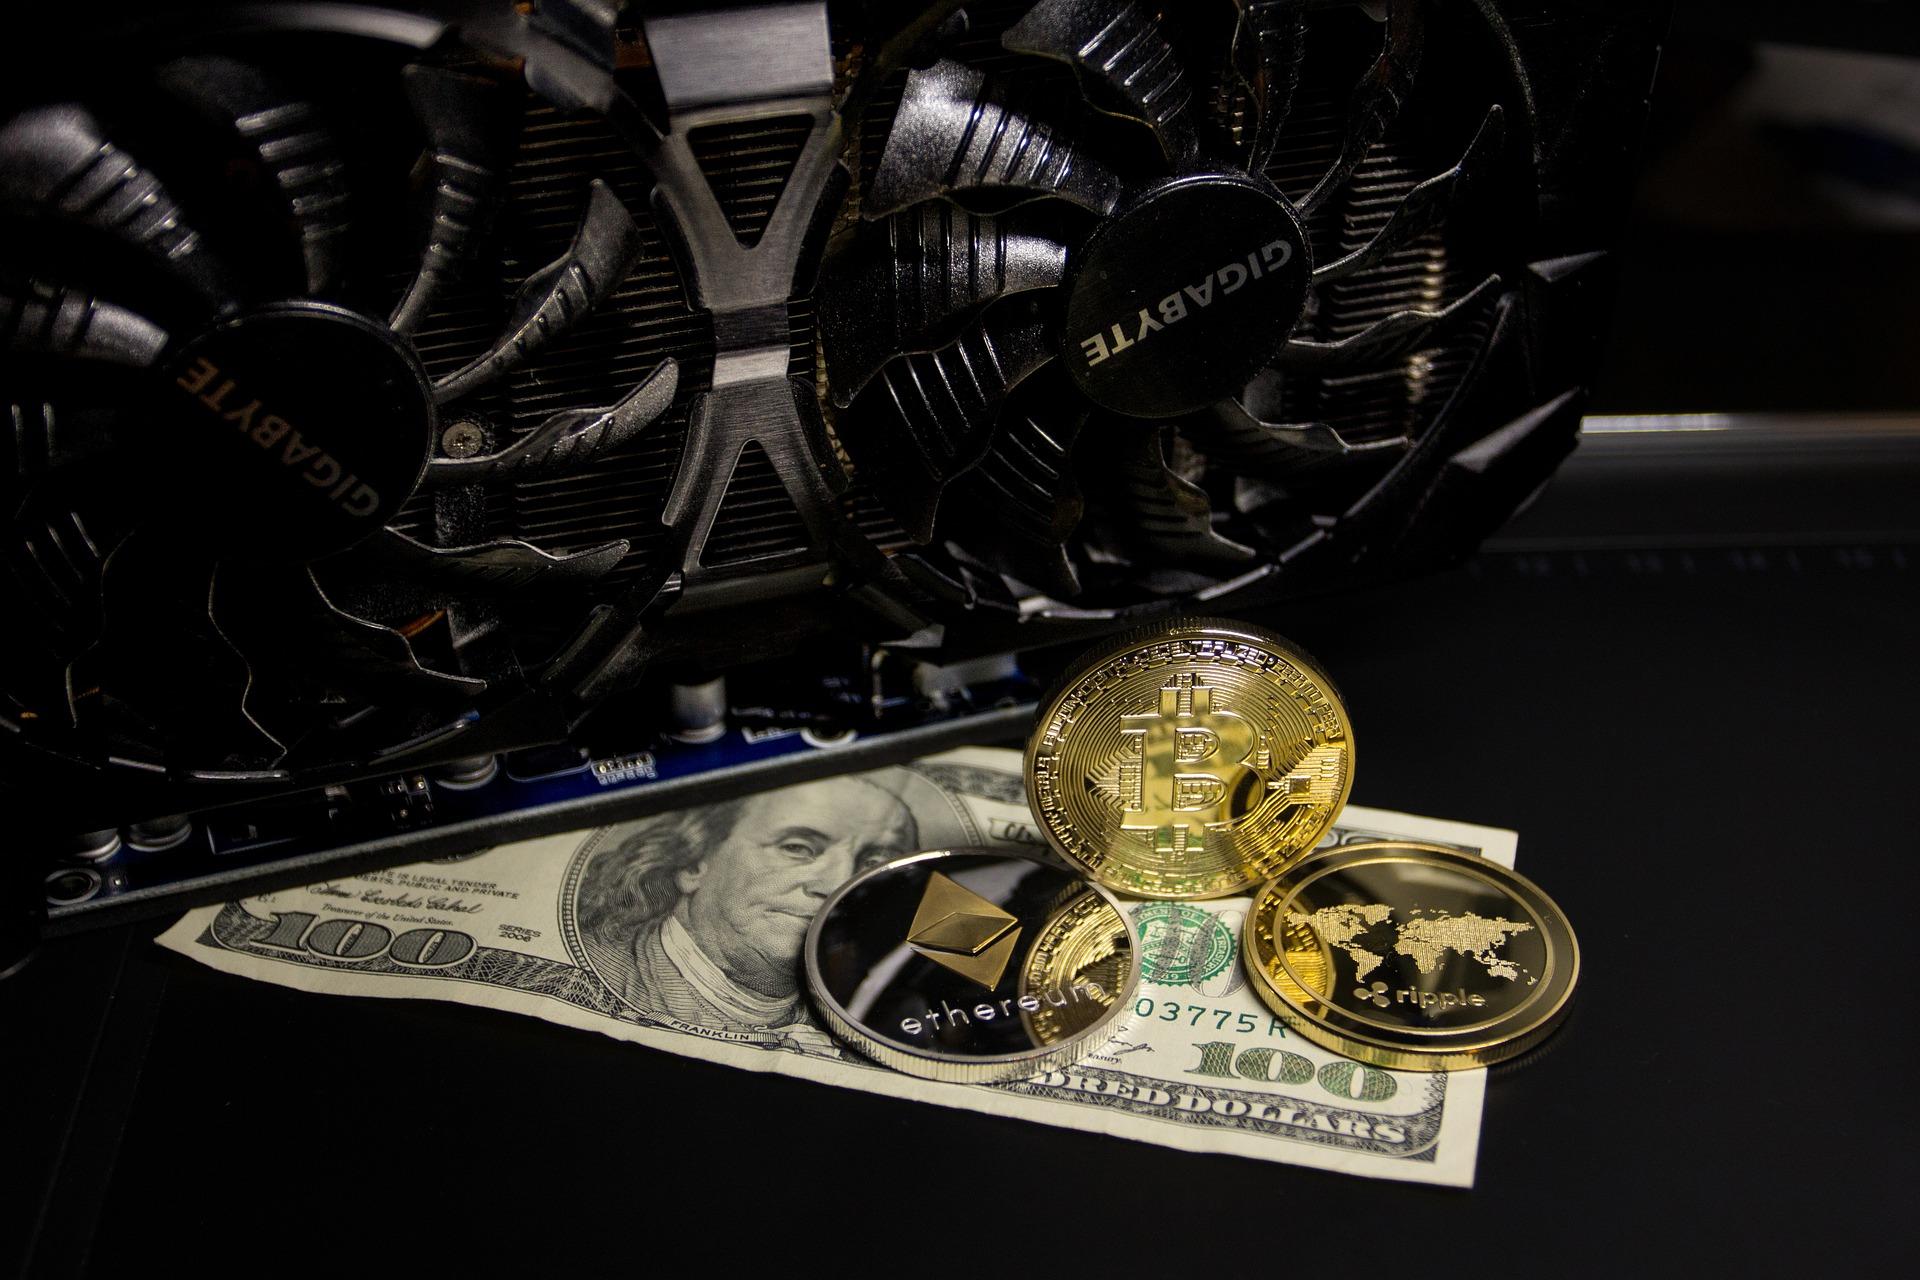 Post cryptum — opodatkuvannja kryptovaljut, povernennja Tezos ta ideaľnyj blockchain